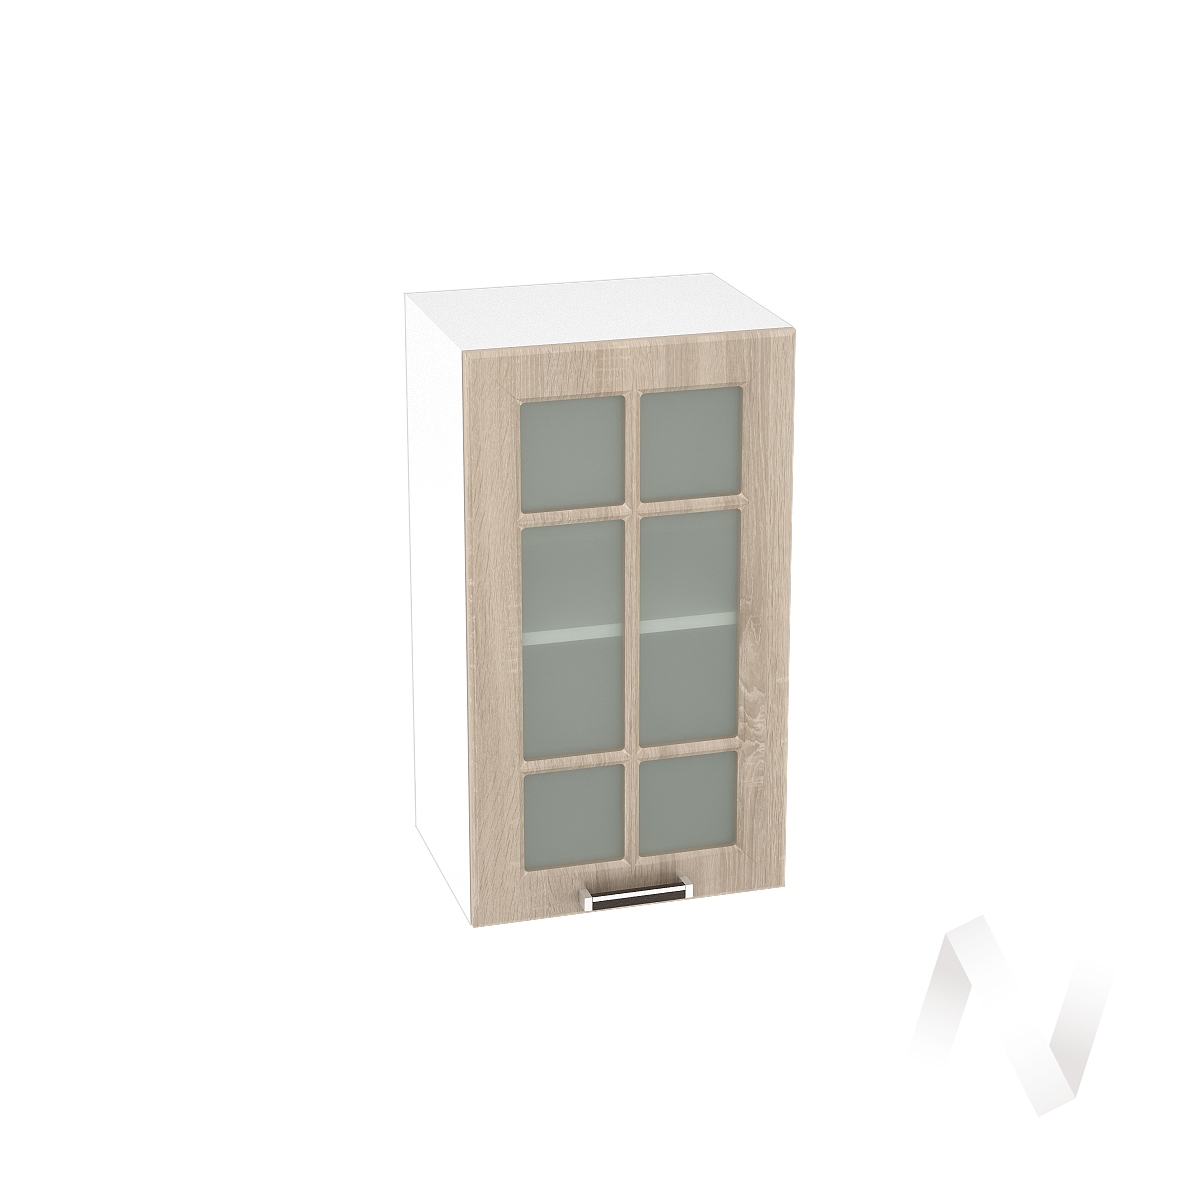 "Кухня ""Прага"": Шкаф верхний со стеклом 400, ШВС 400 (дуб сонома/корпус белый)"